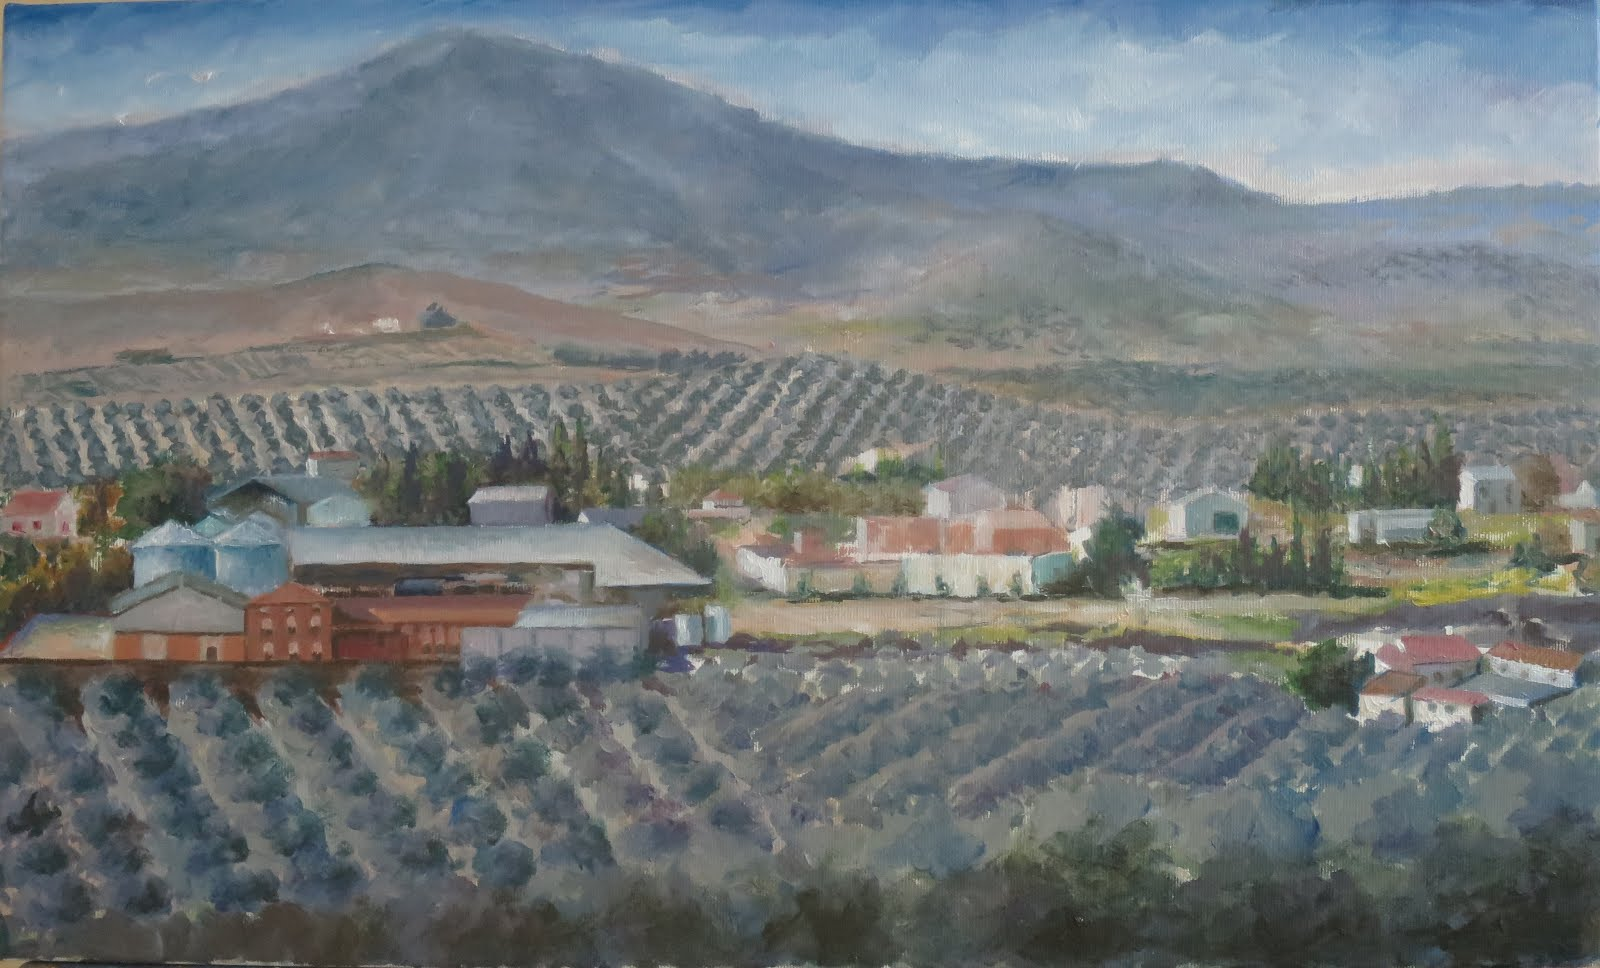 Gracíez-1, Torredelcampo (10M)